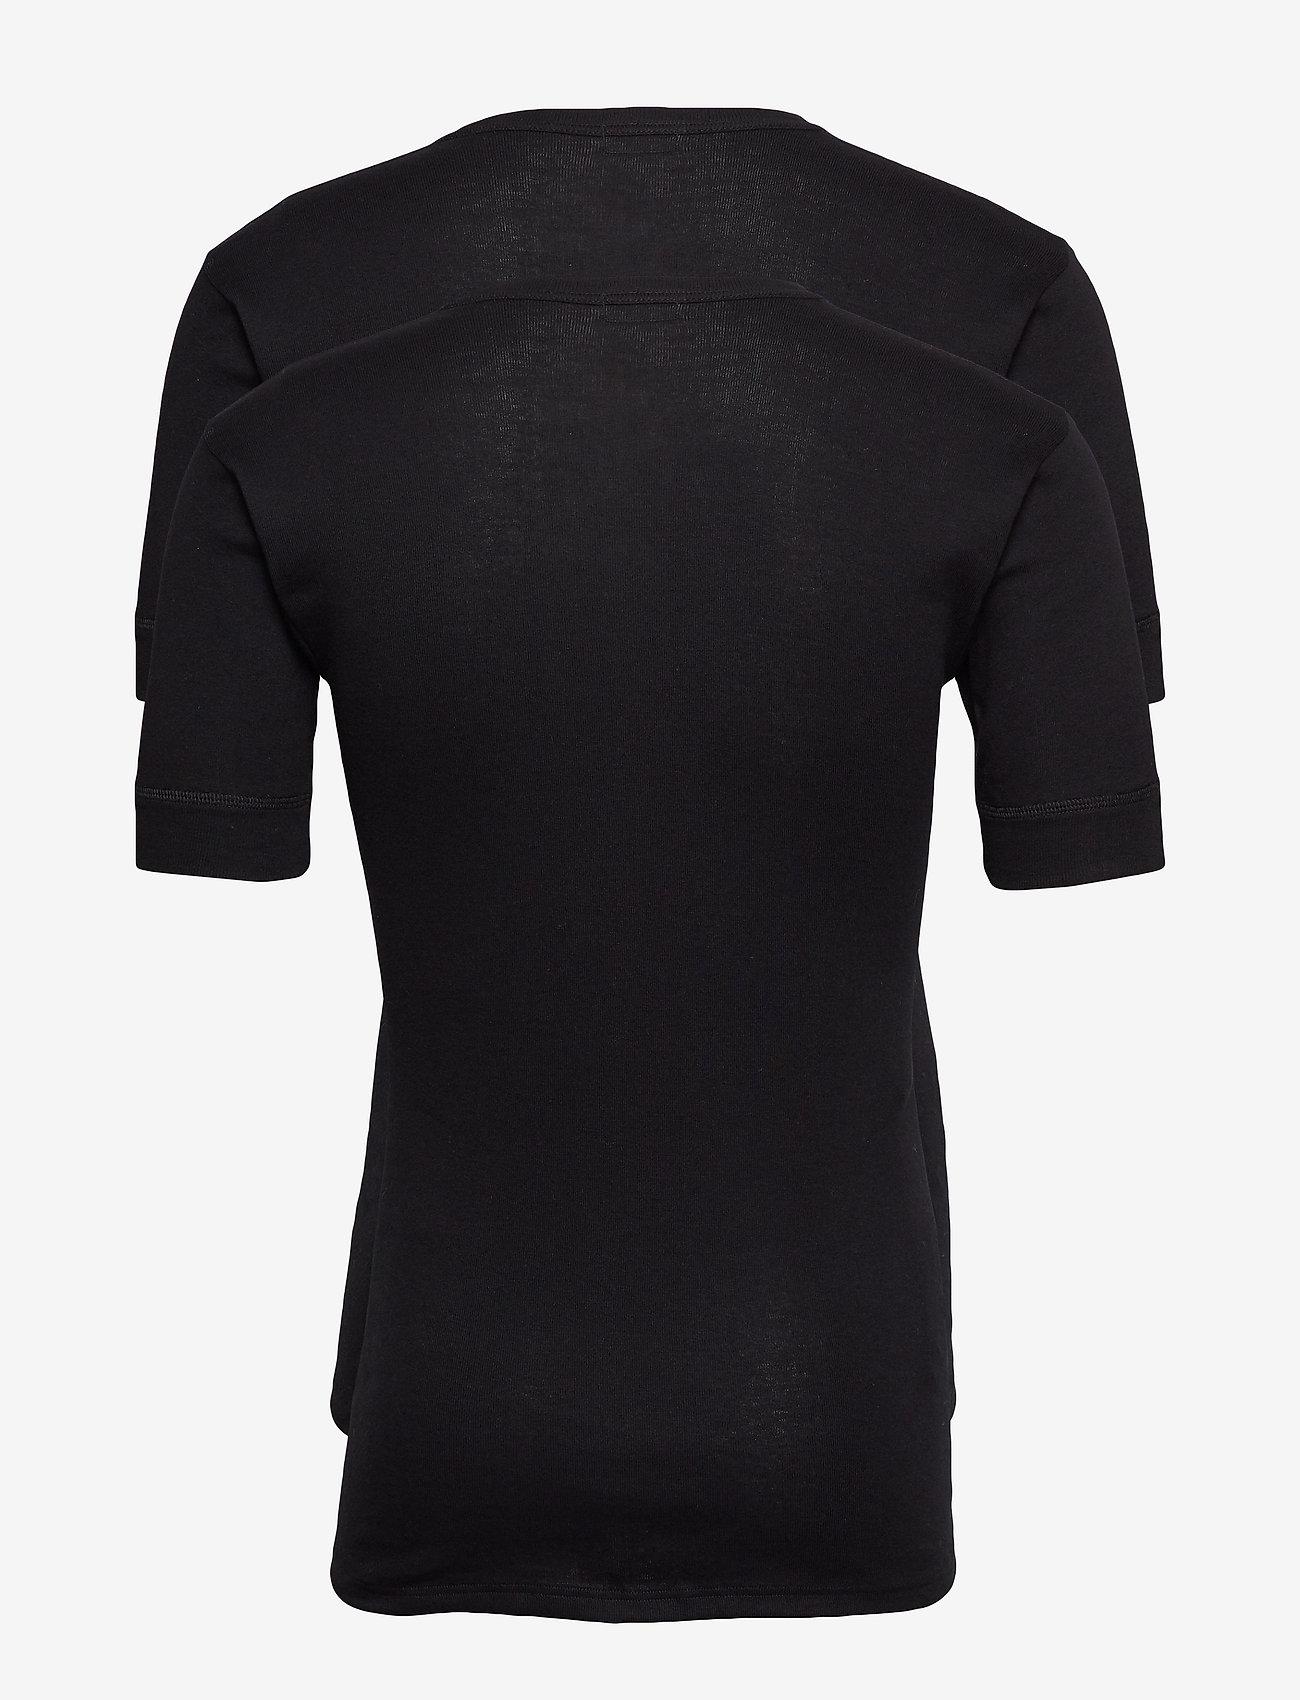 JBS - JBS t-shirt 2-pack organic - t-shirts basiques - black - 1